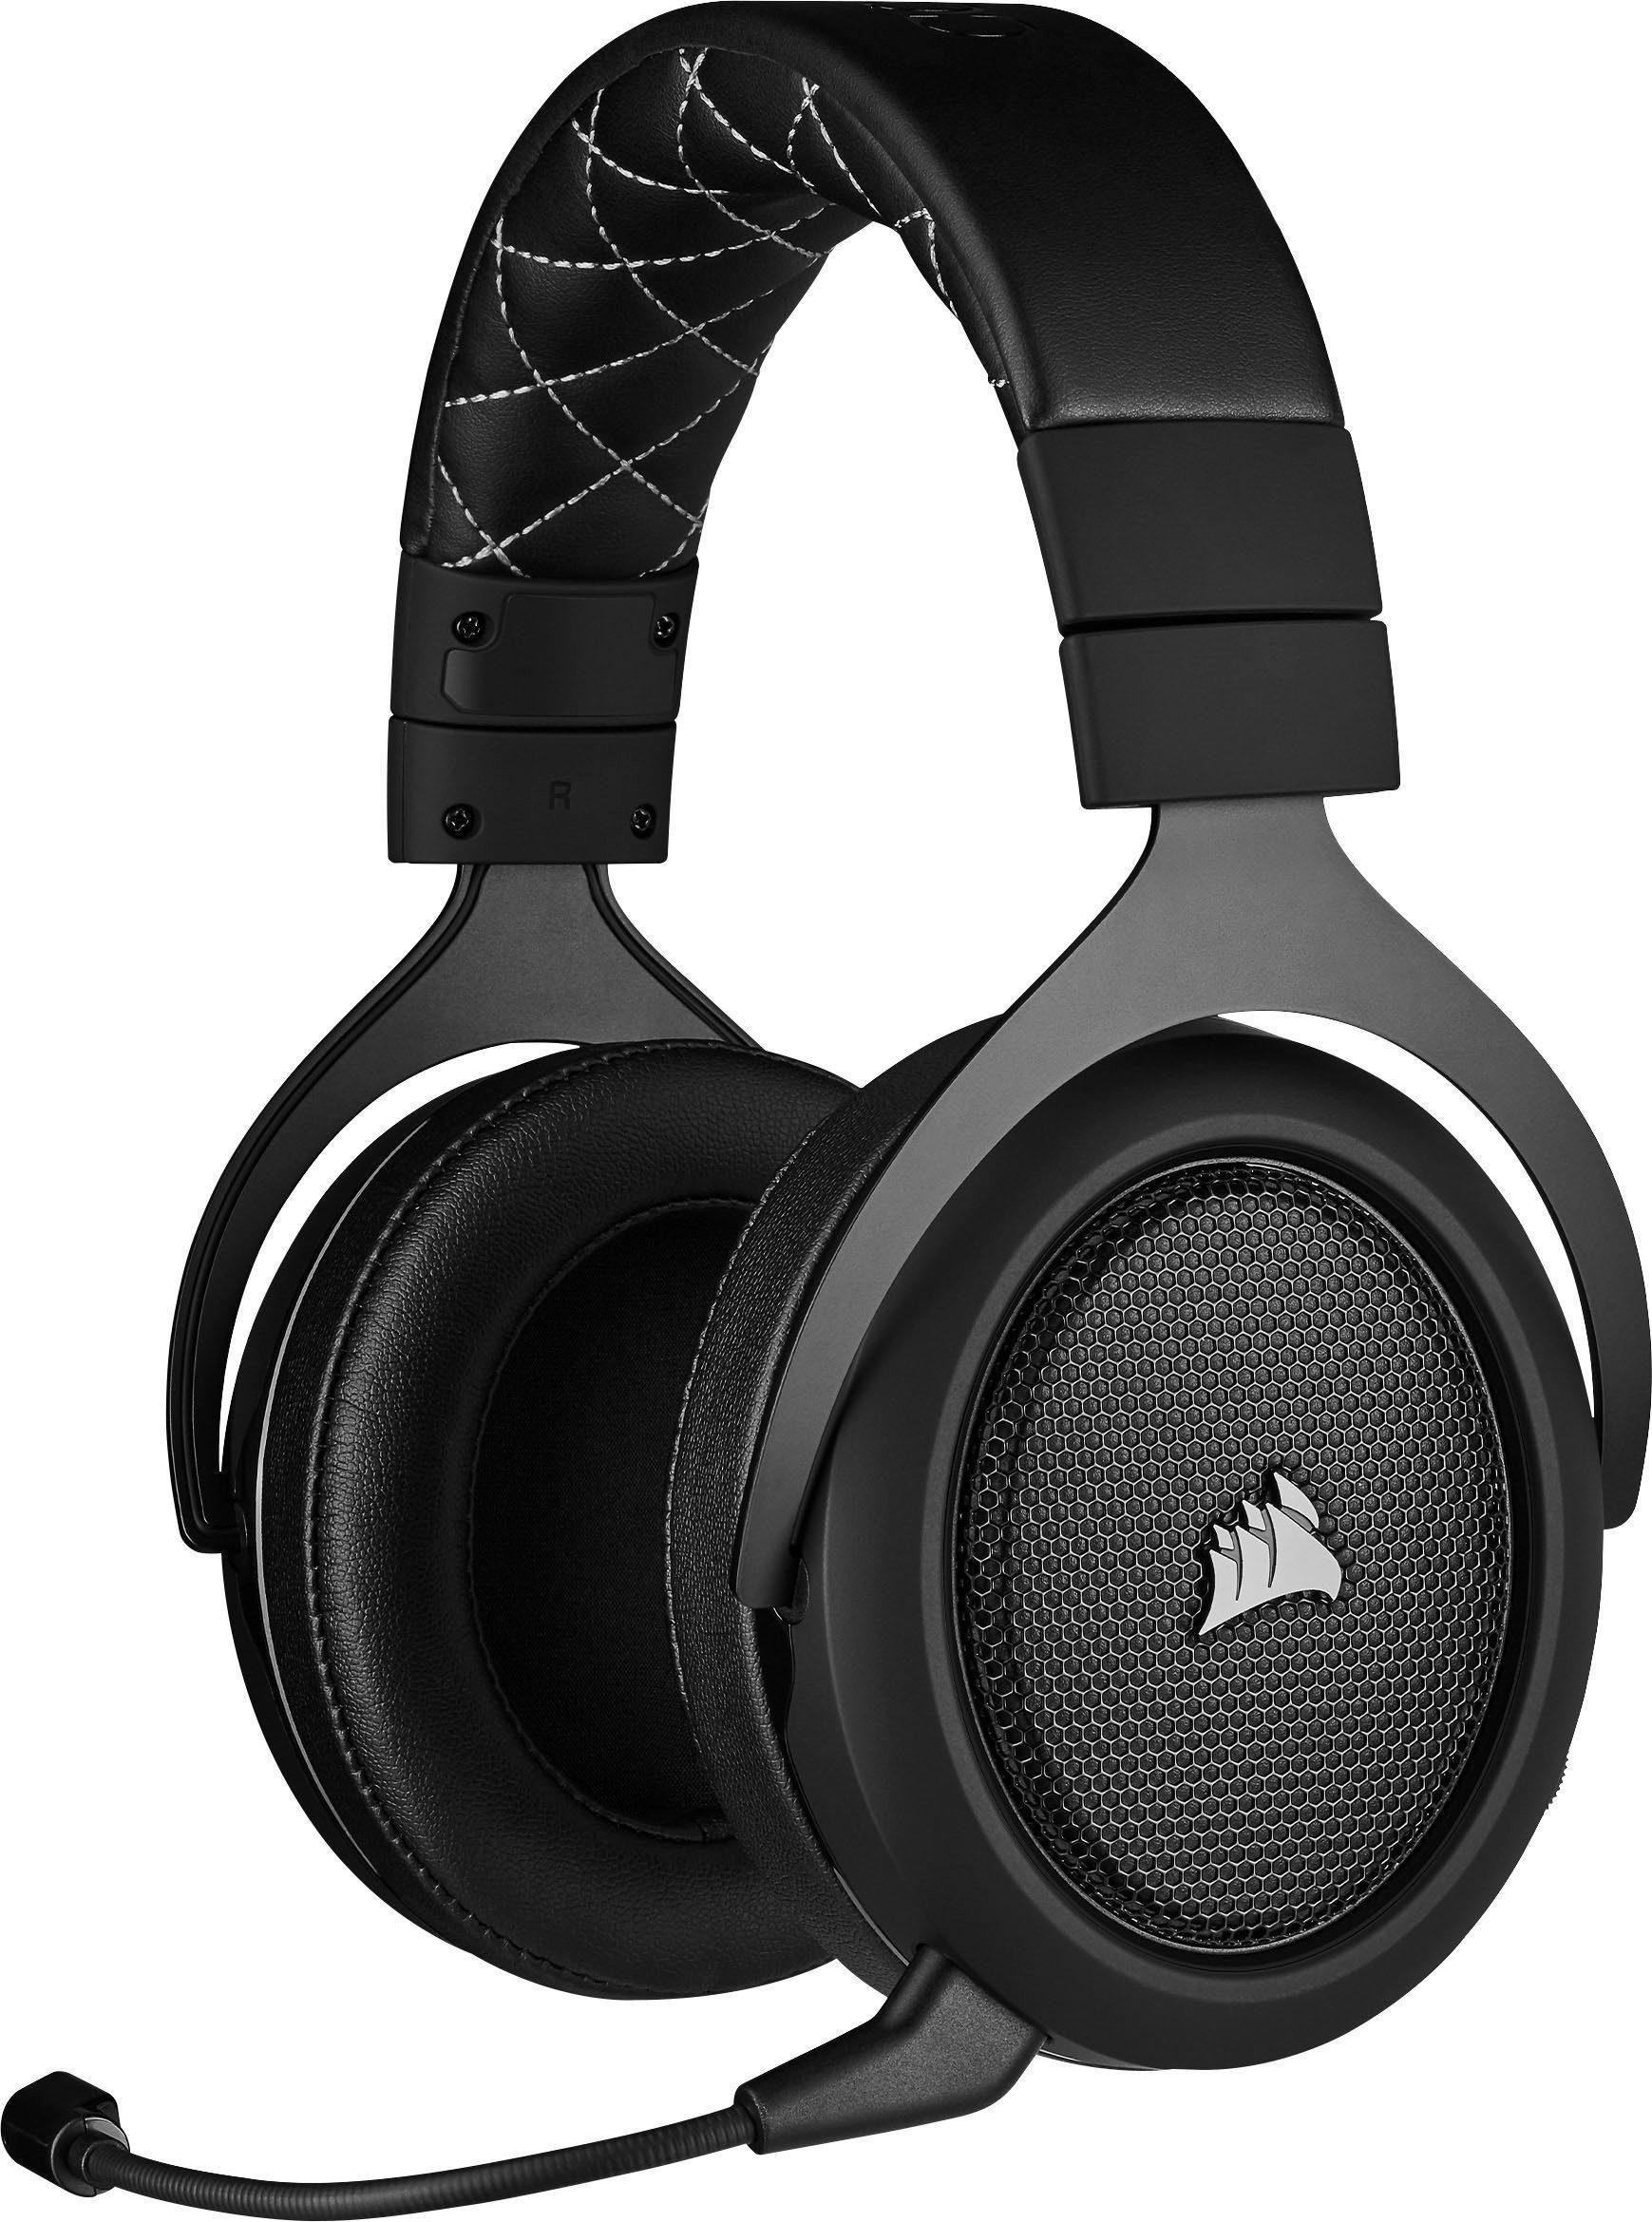 Corsair HS70 Pro Wireless Gaming Headset Schwarz Over Ear Gaming Headset